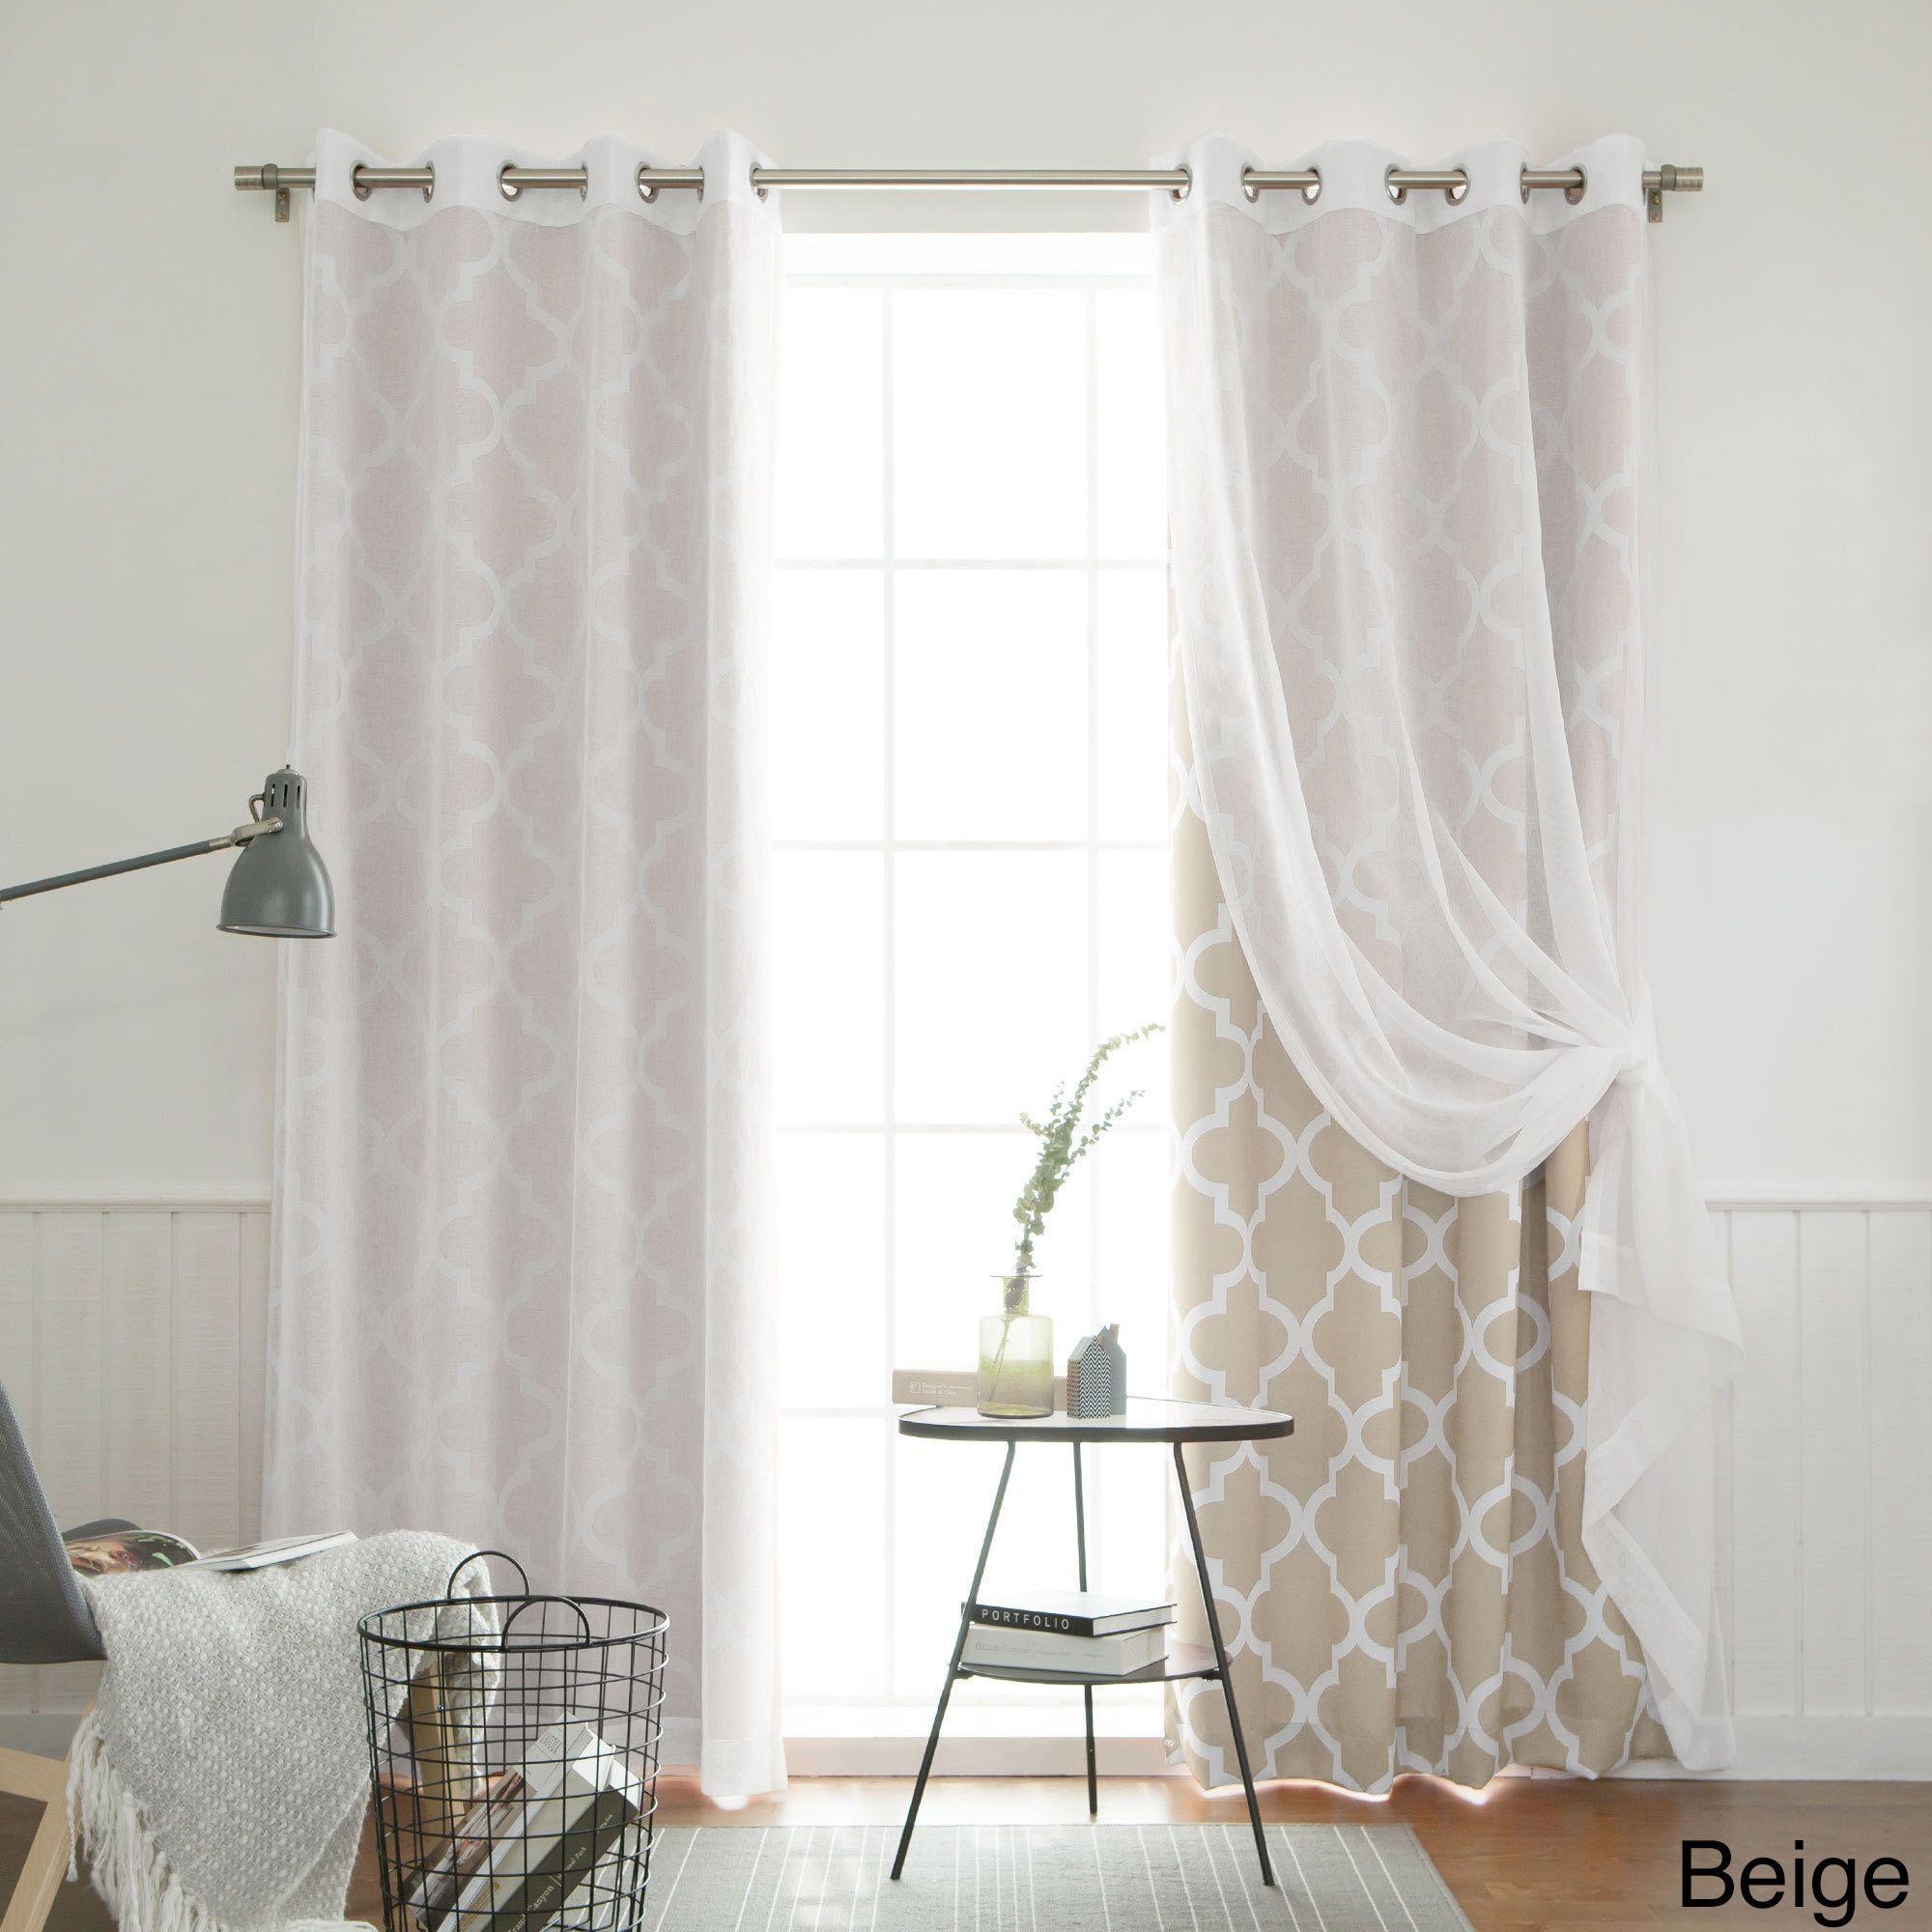 Aurora home mix u match curtains muji sheer moroccan room darkening